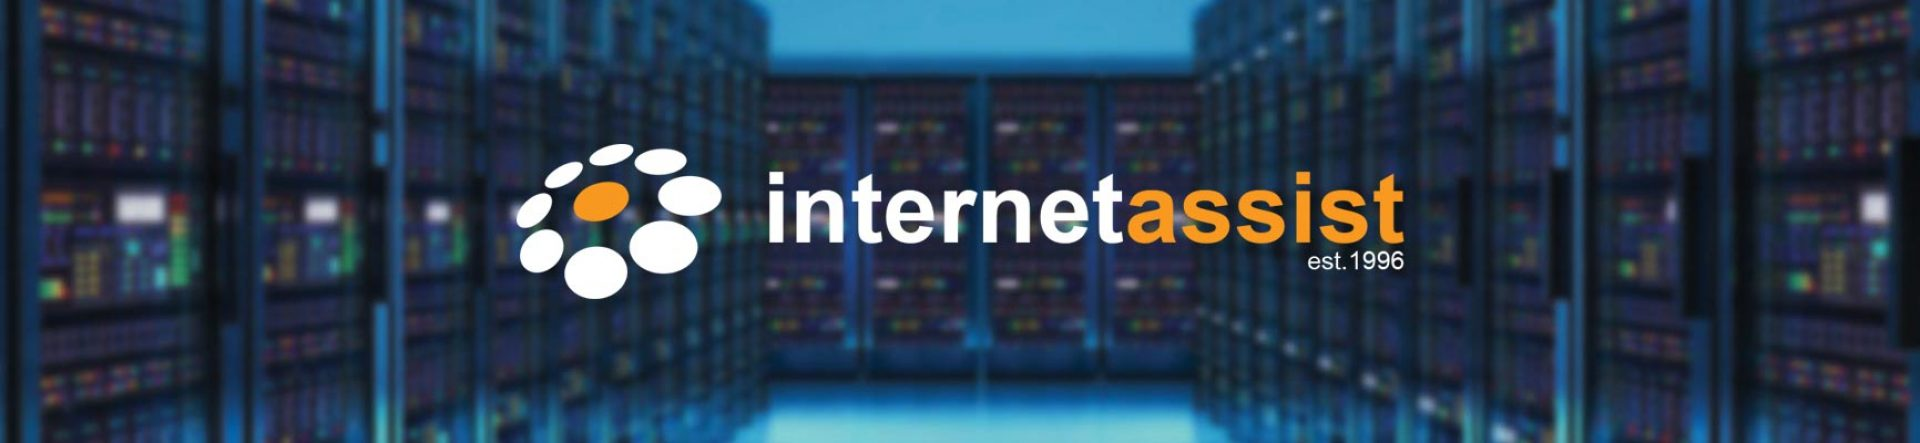 servers-logo